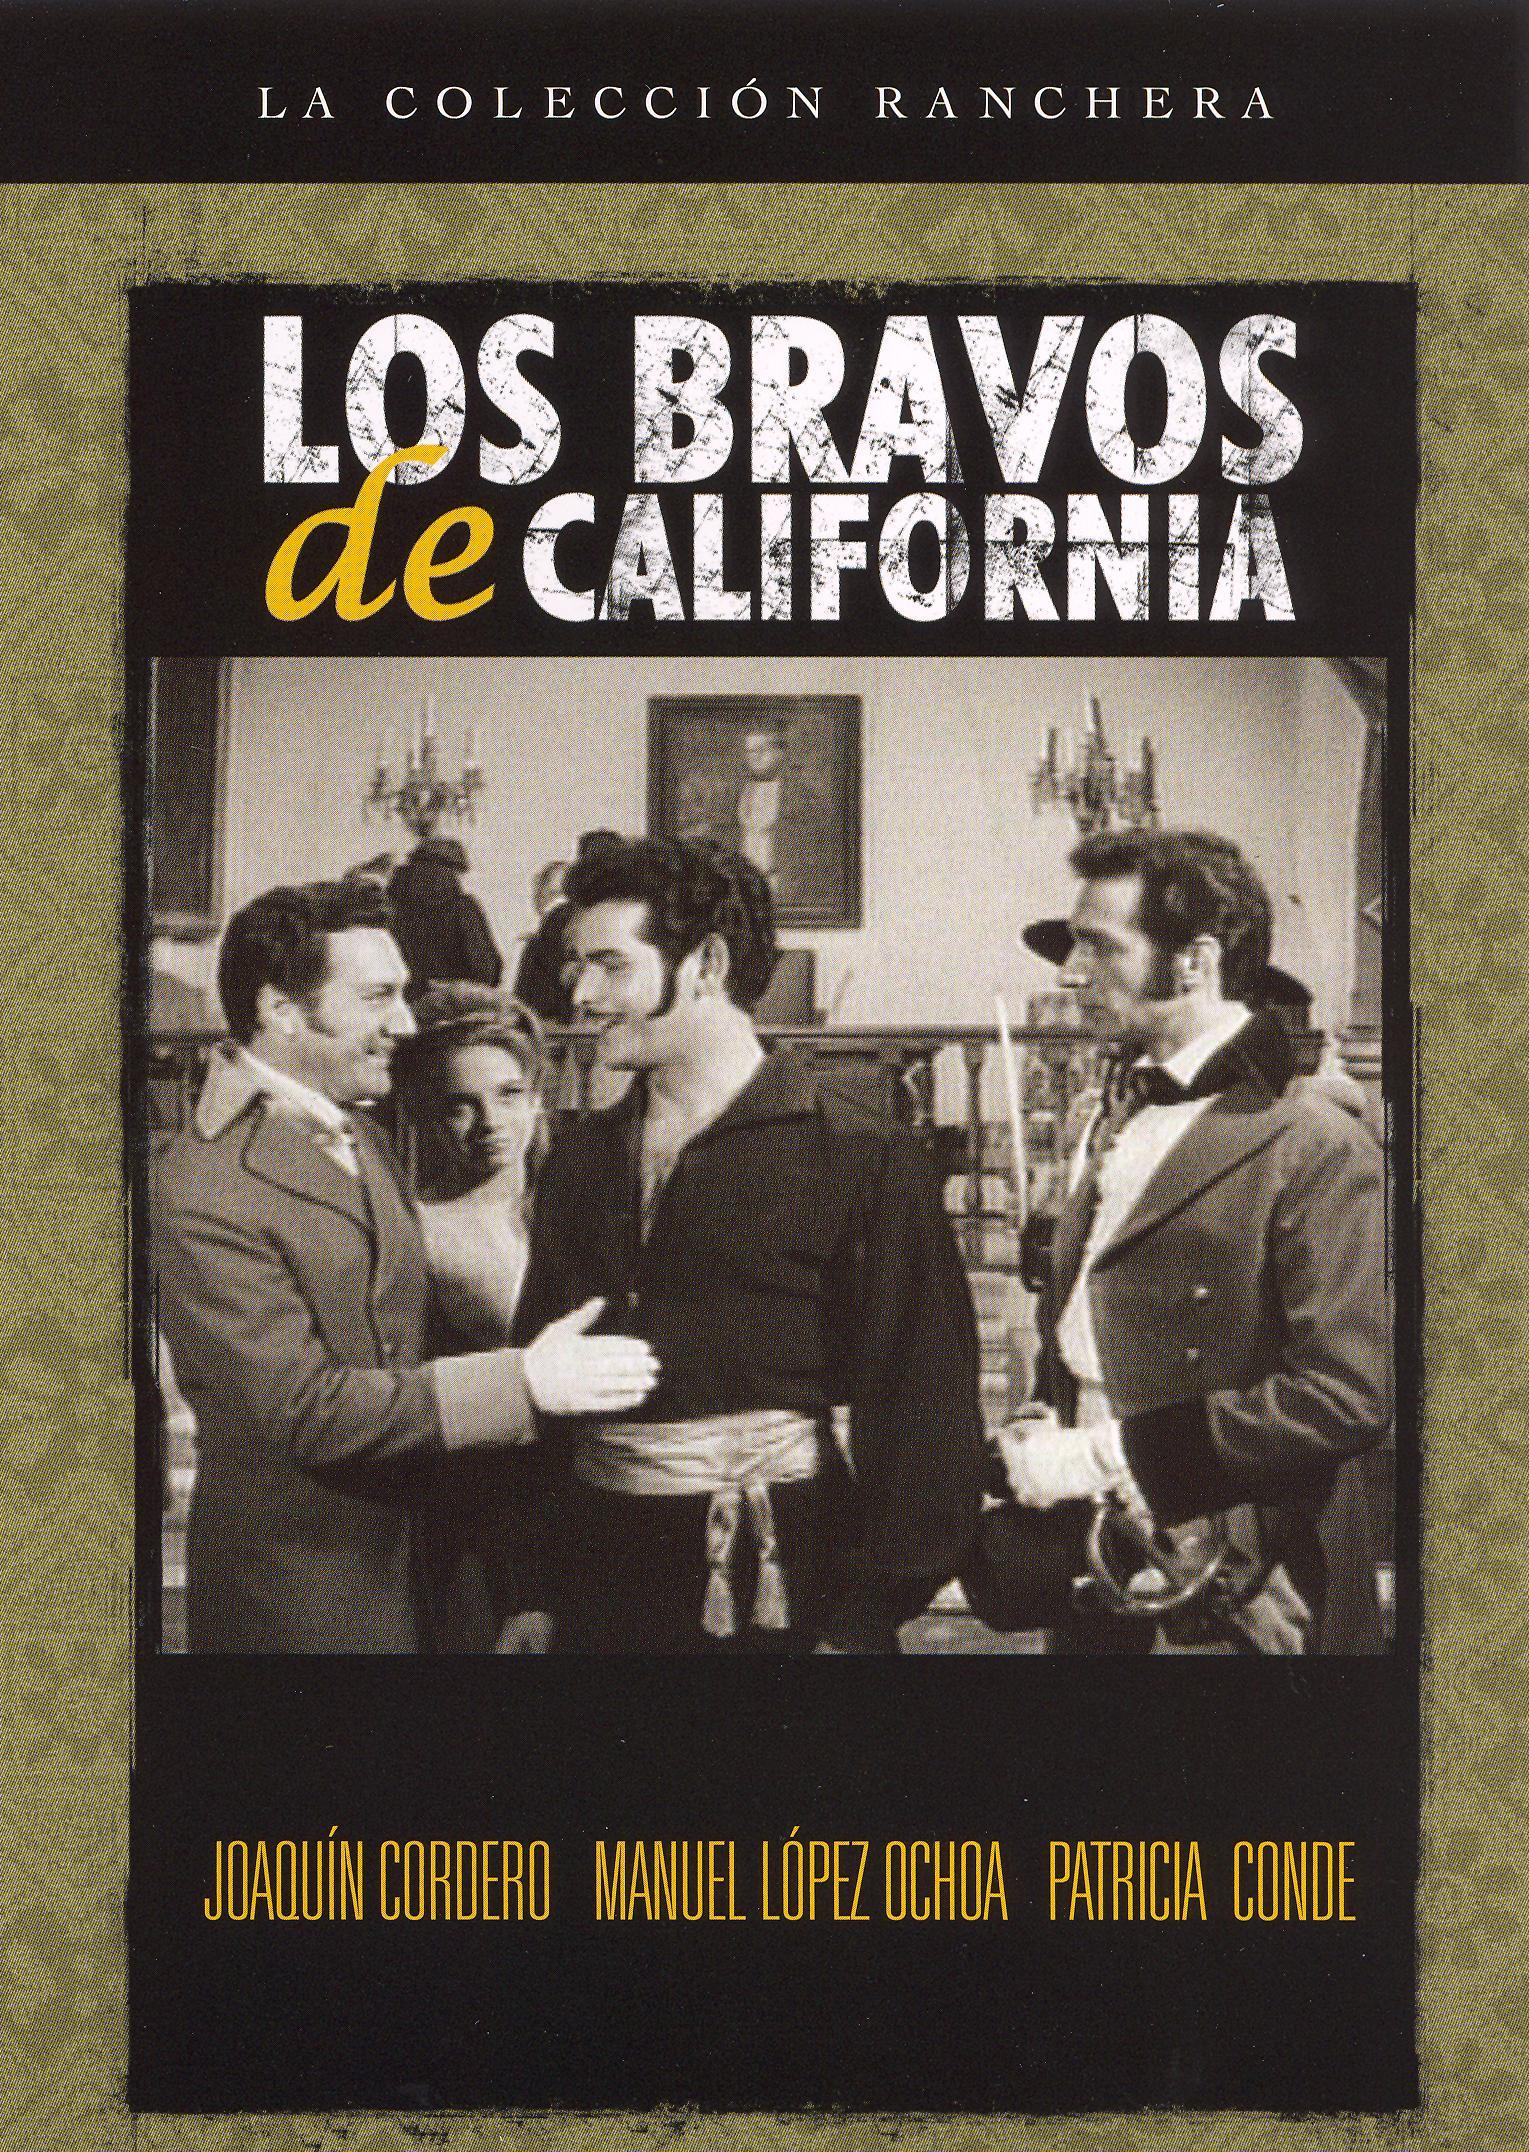 Las Bravos de California